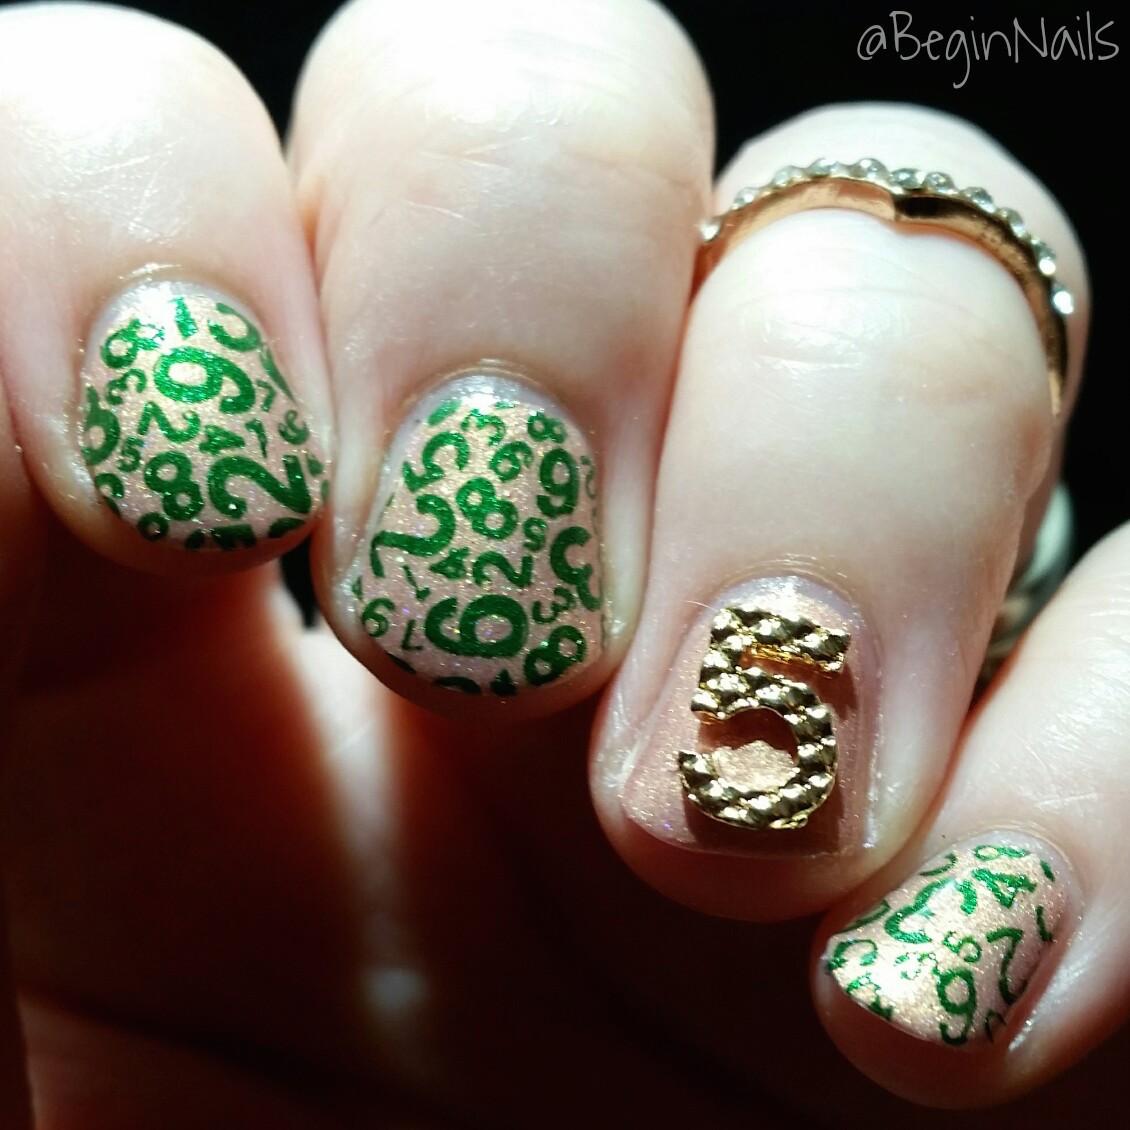 Let S Talk Nail Art: Let's Begin Nails: It Girl Nail Art IG110 Plate Manis Part 2